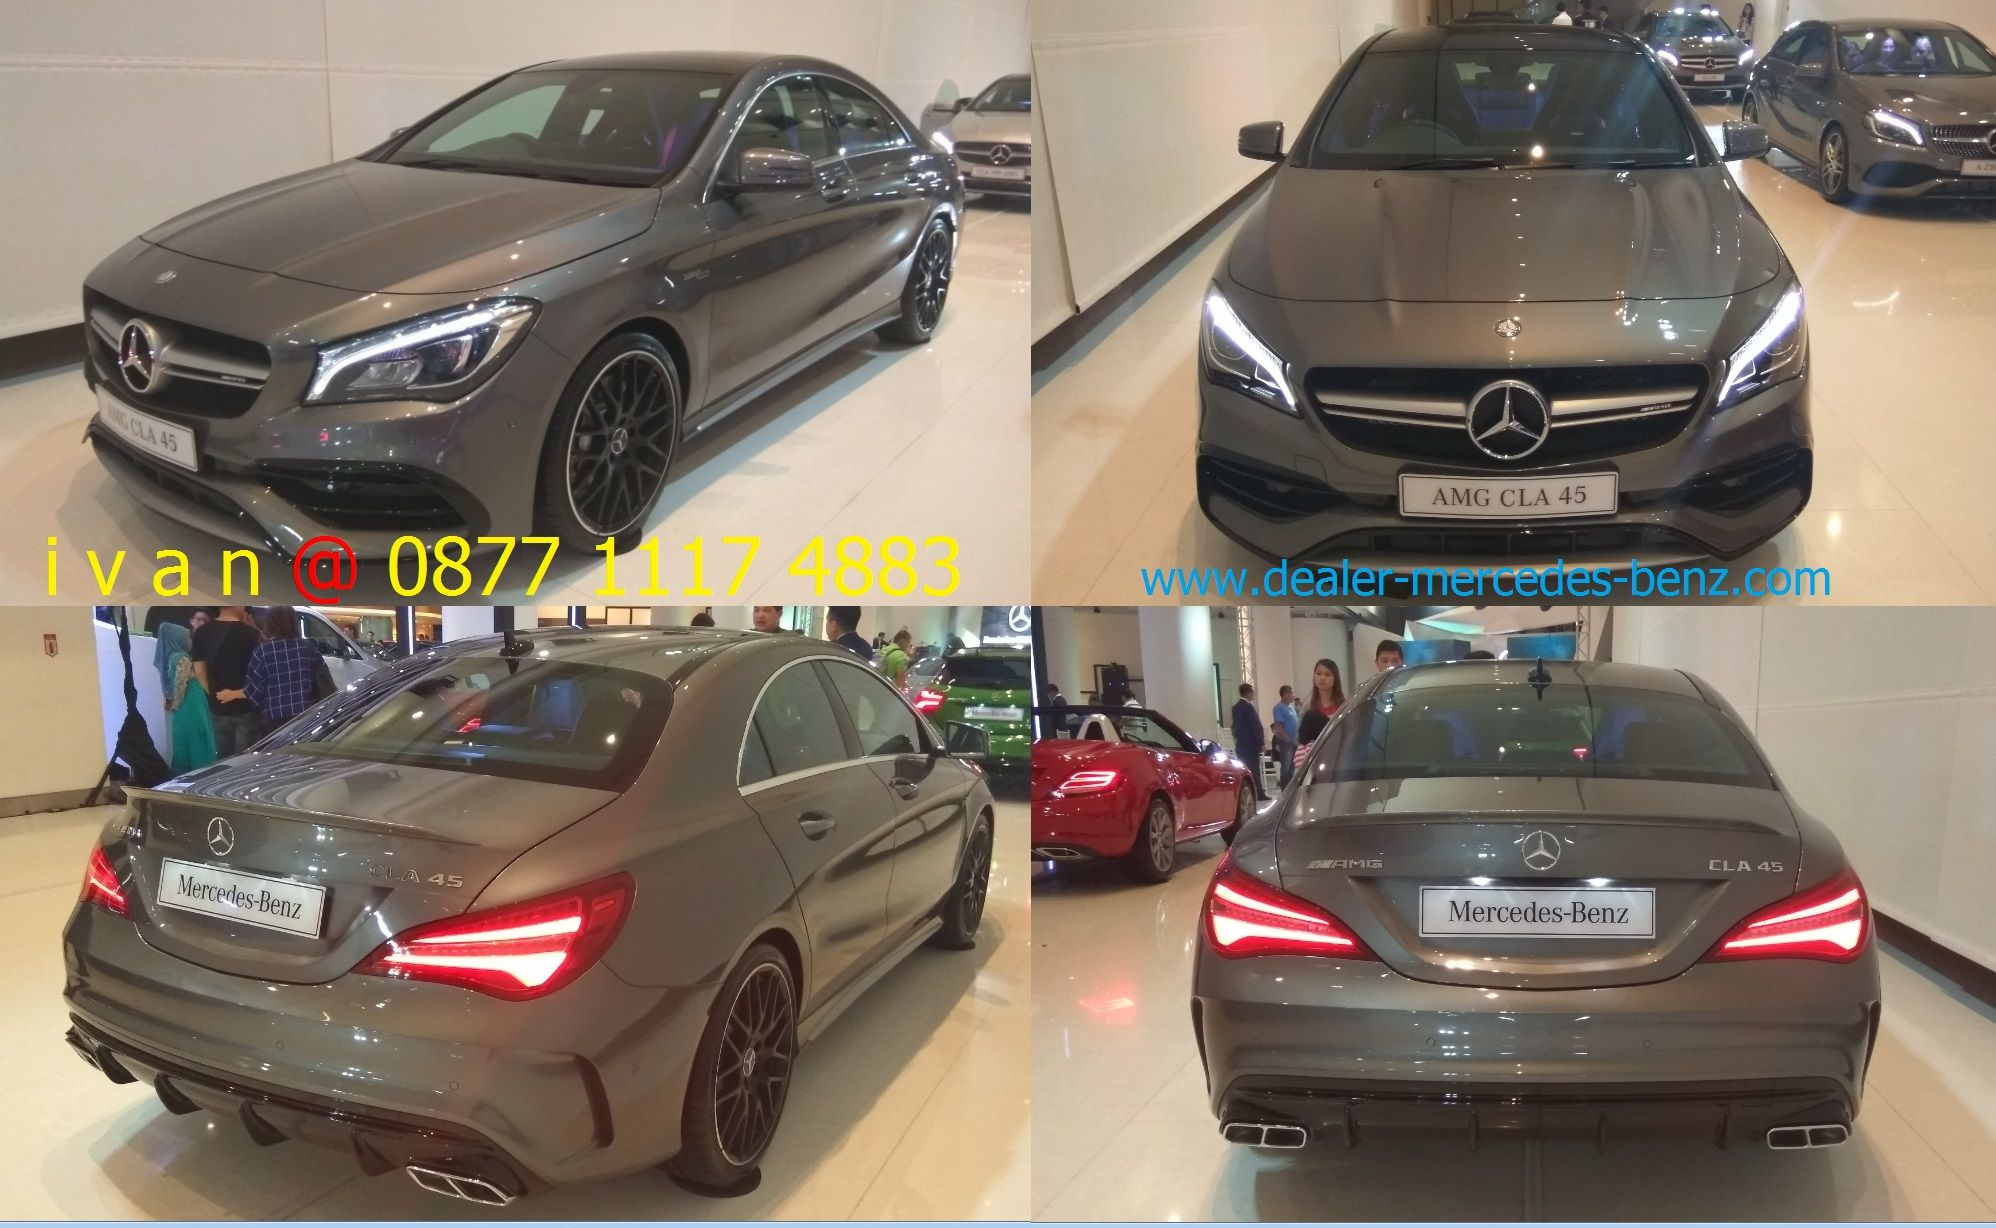 Cla Class Cla 45 Amg 2017 Indonesia Mountain Grey Dealer Mercedes Benz Jakarta Mercedes Benz Benz New Mercedes